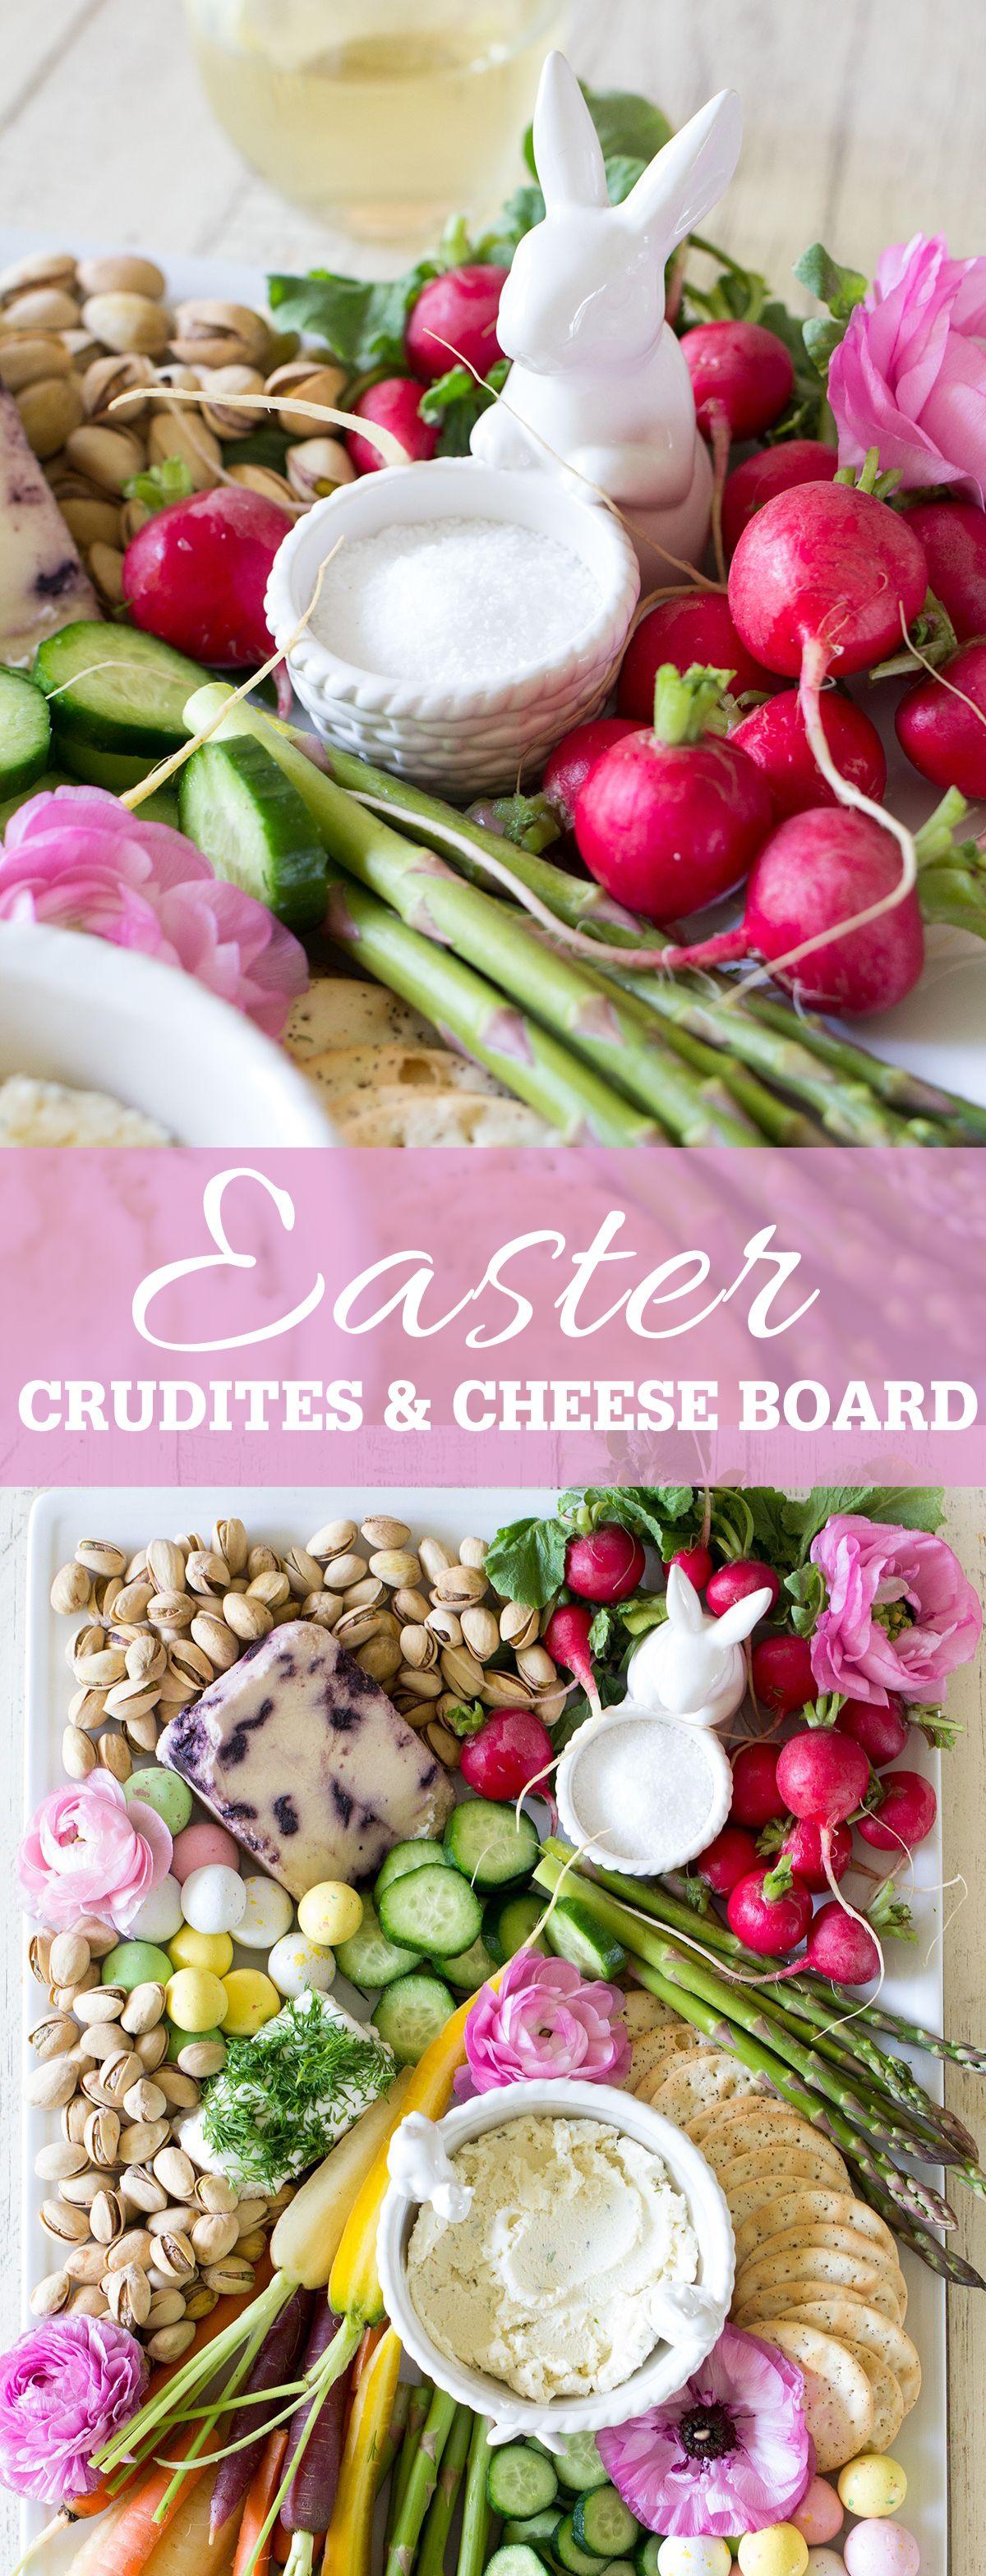 Easter Cheese and Crudites Board